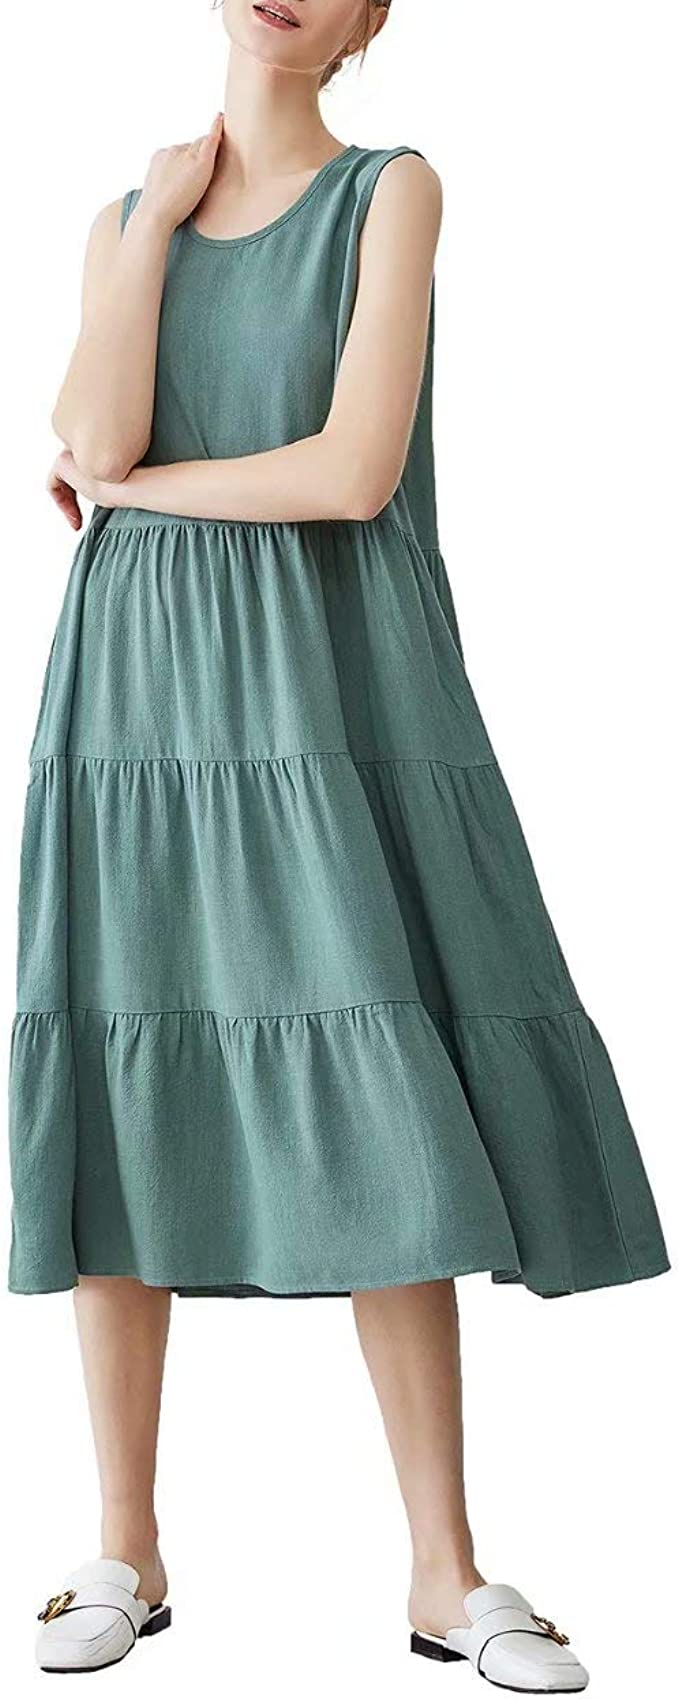 Work Linen Dress breastfeeding friendly maxi